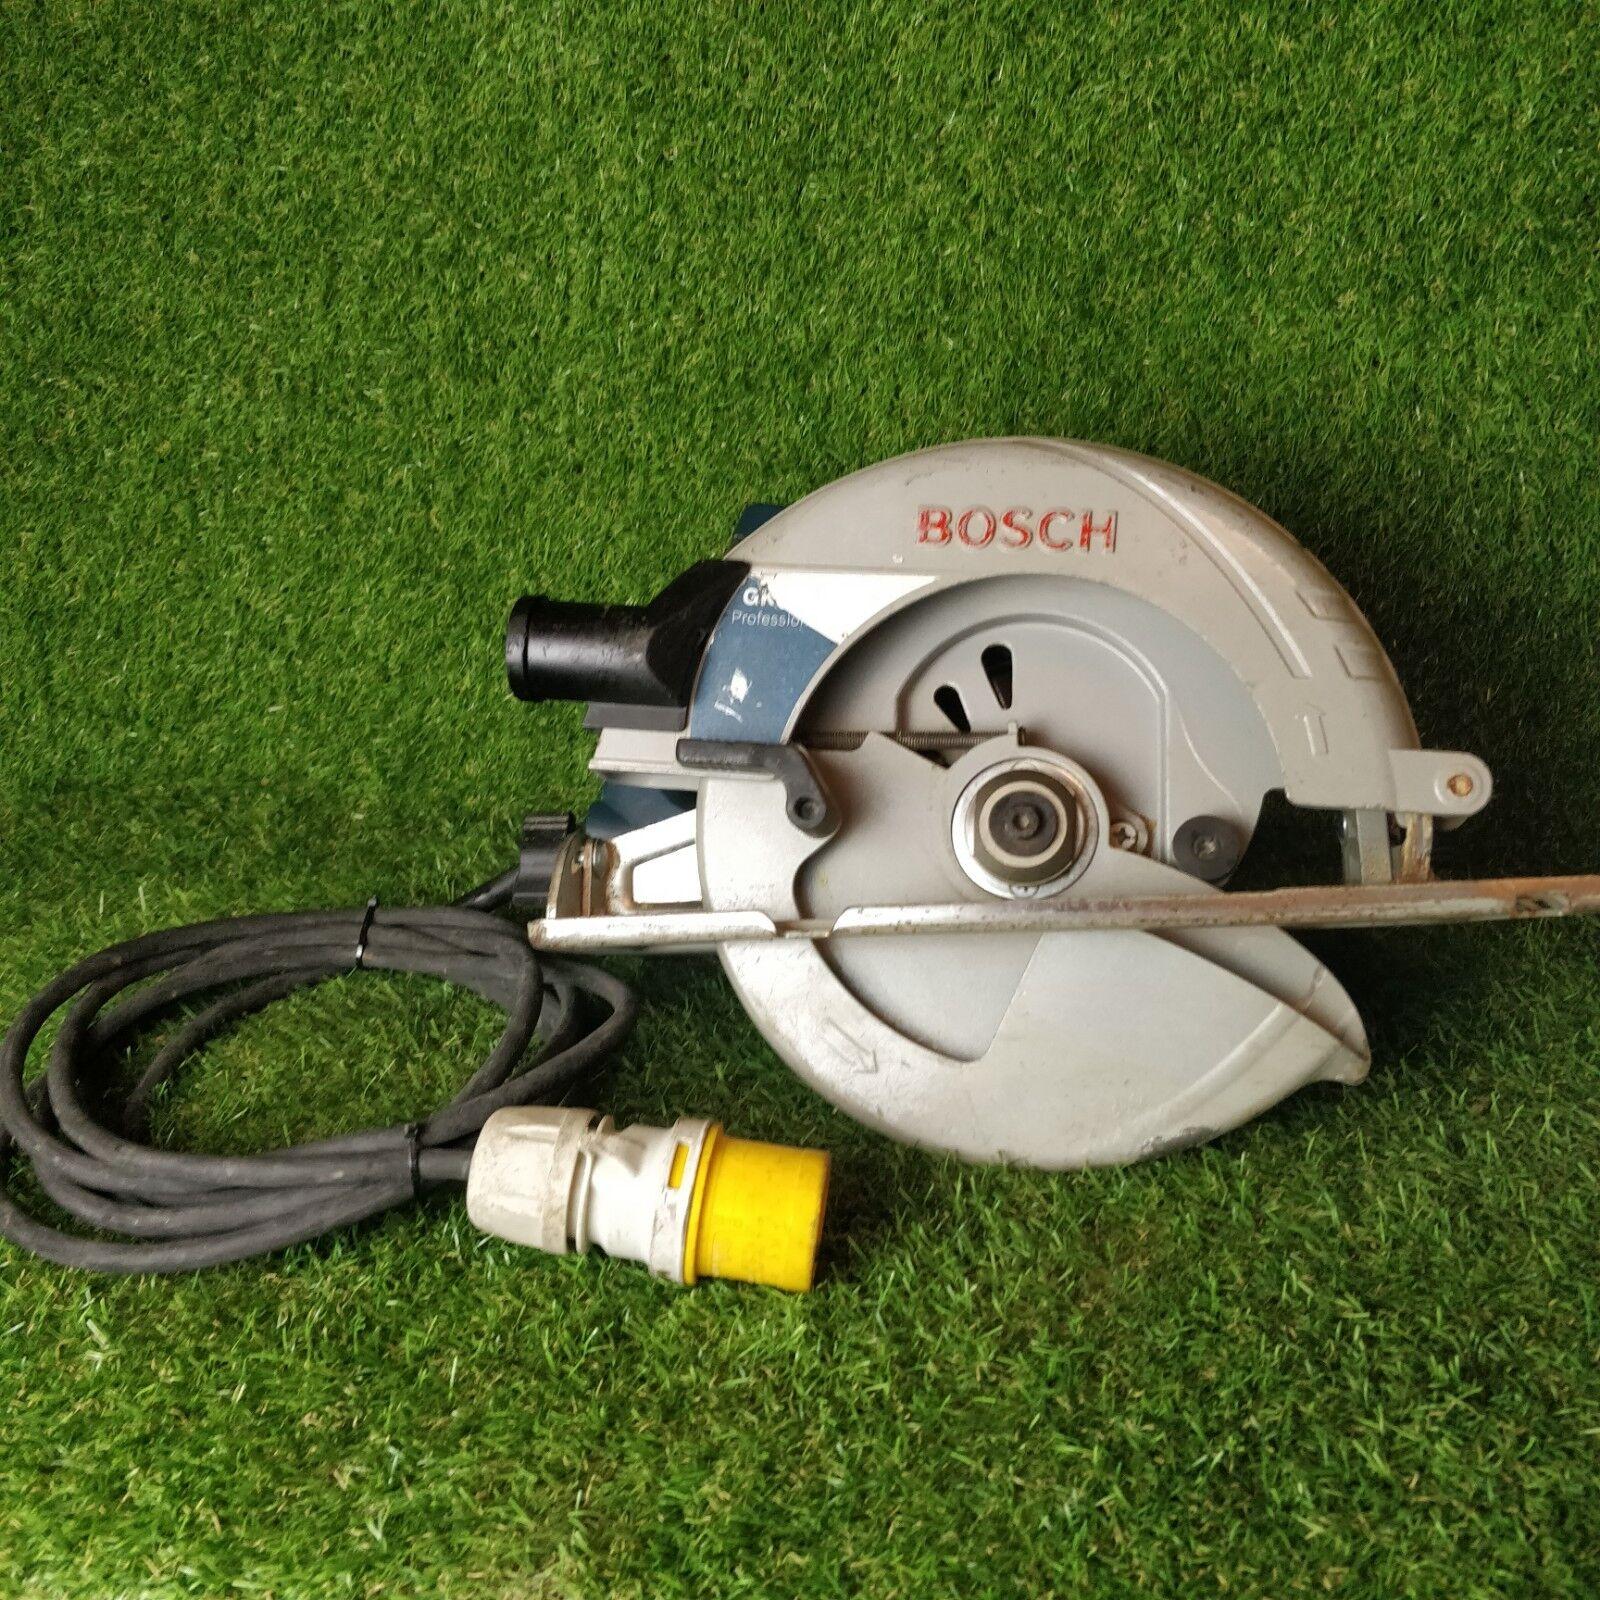 BOSCH GKS 85 110v Circular Saw. GWO . FREE P&P '1376